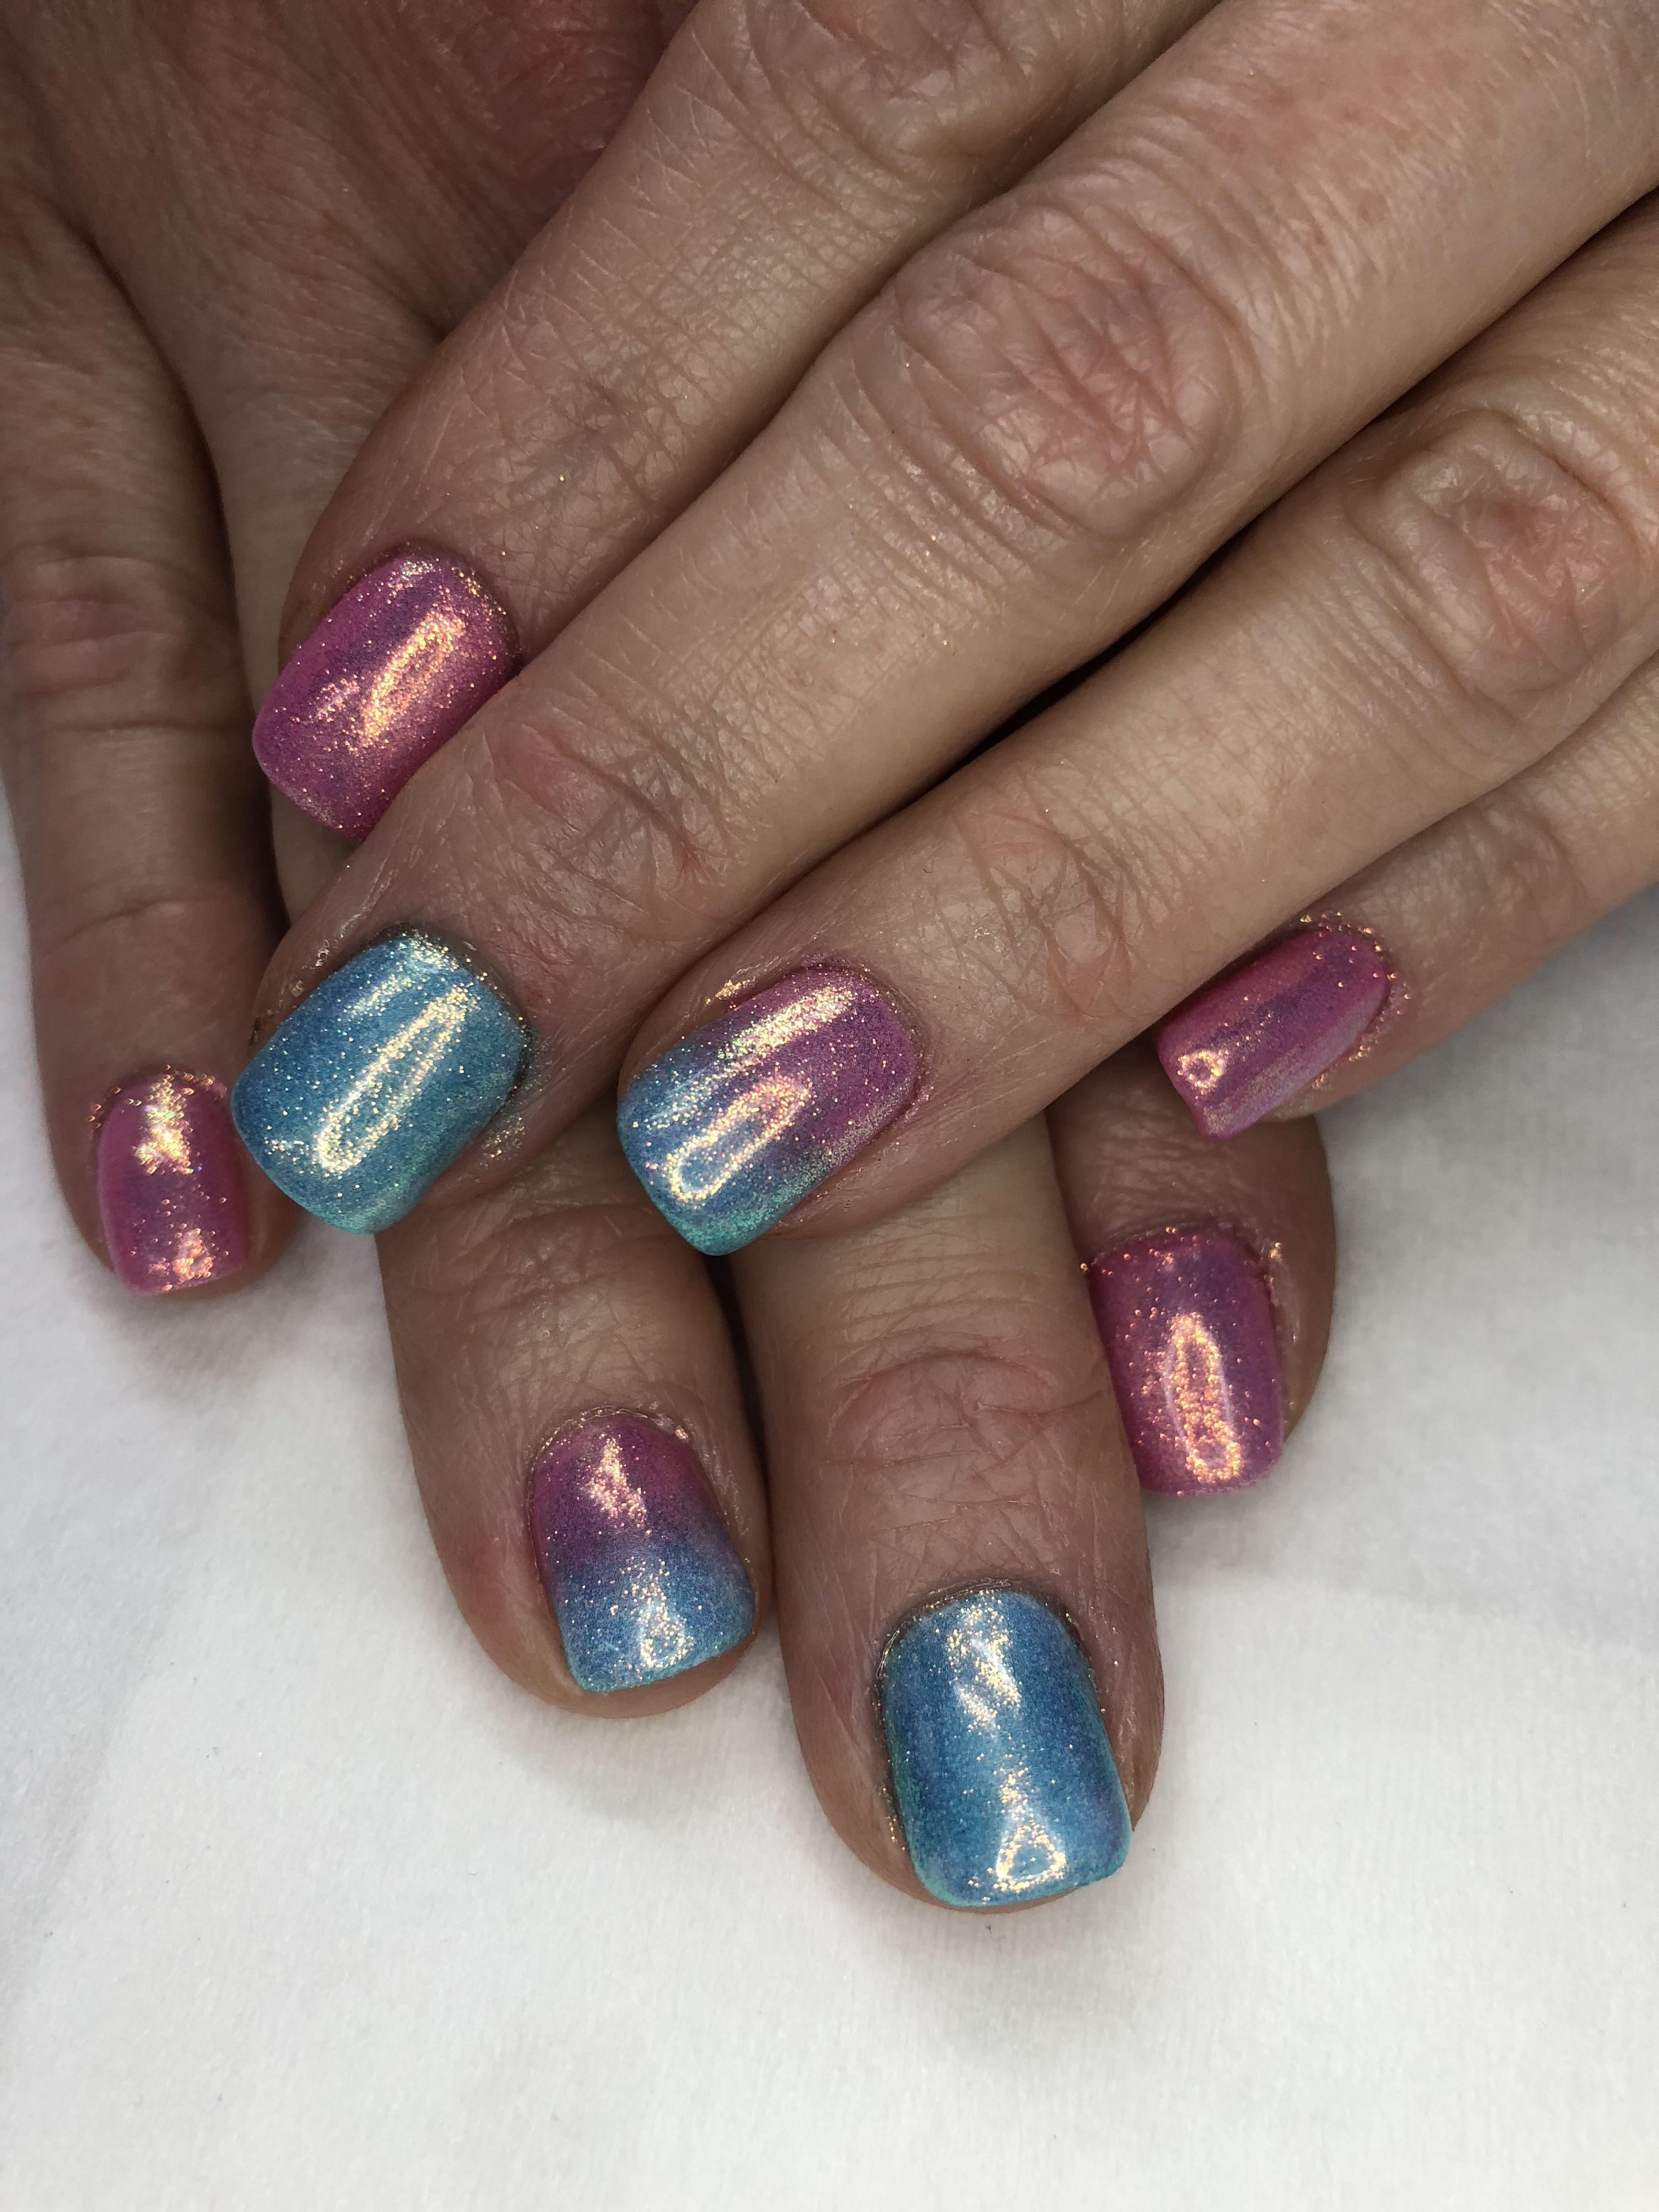 Indigo Pink Blue Ombr Mermaid Powder Gel Nails Gel Nail Designs